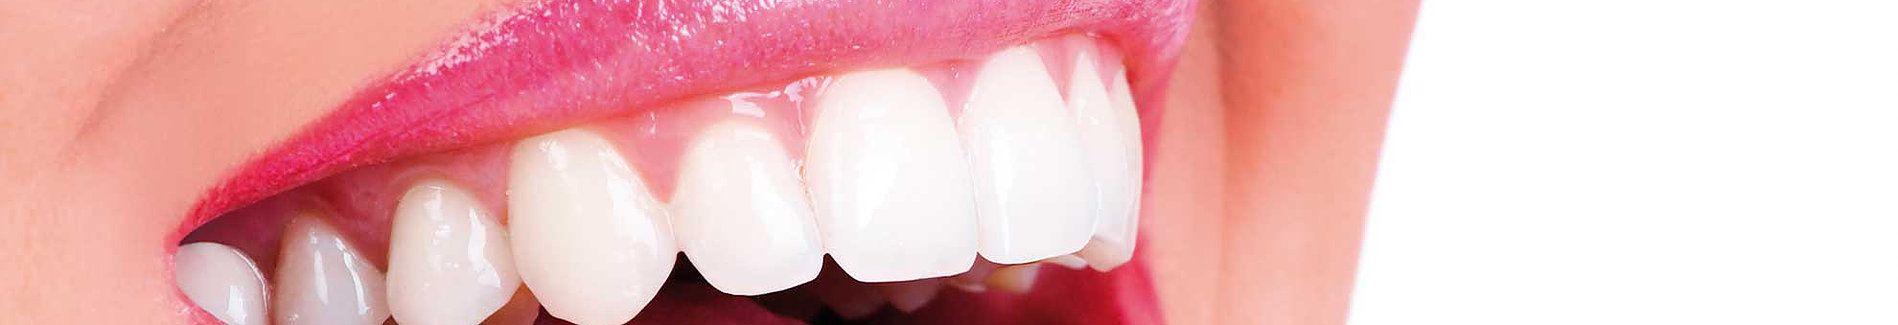 tratamientos dentales clinica dental caparroso macrident navarra